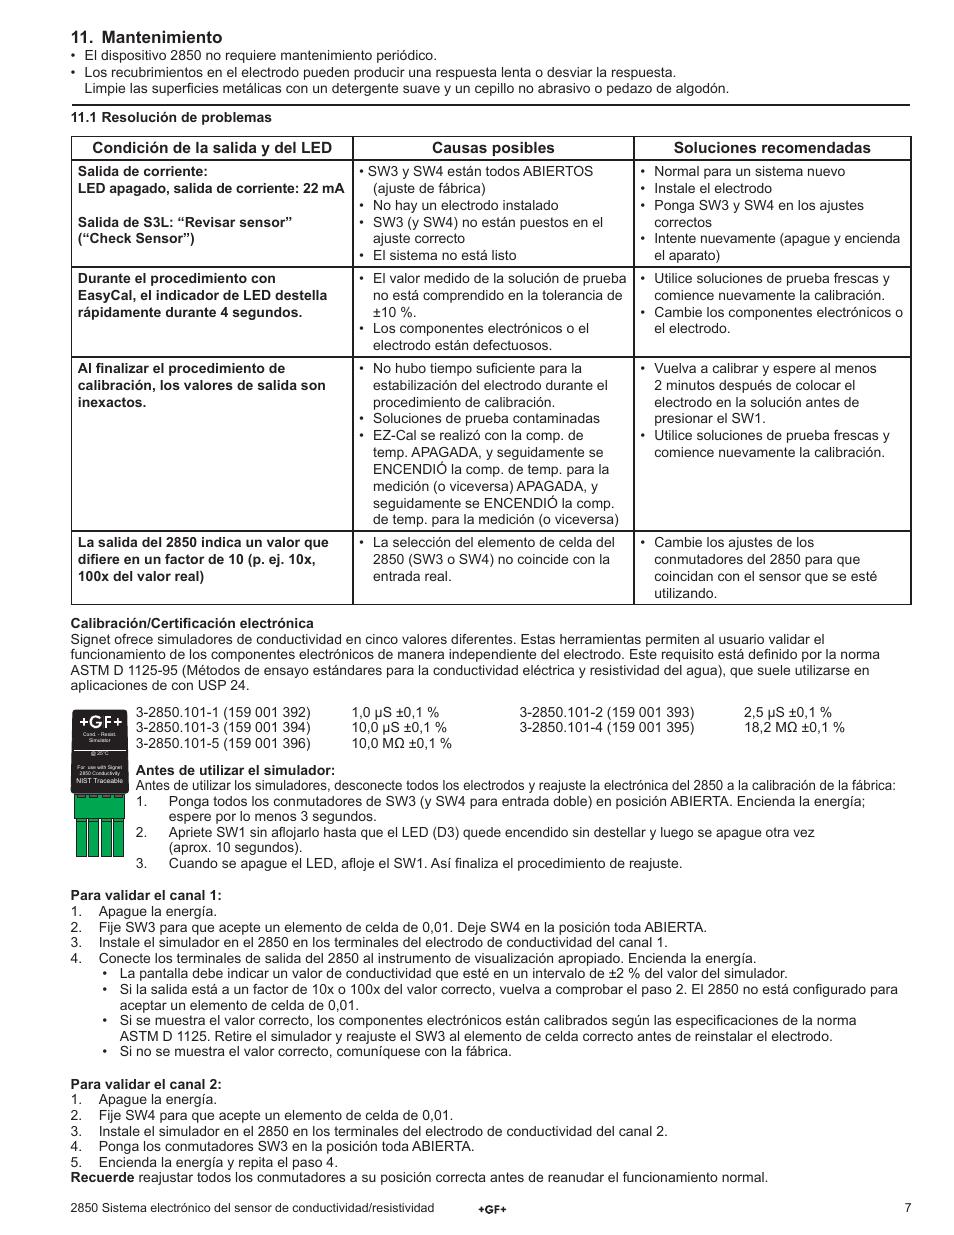 Mantenimiento | GF Signet 2850 Conductivity-Resistivity Sensor ...